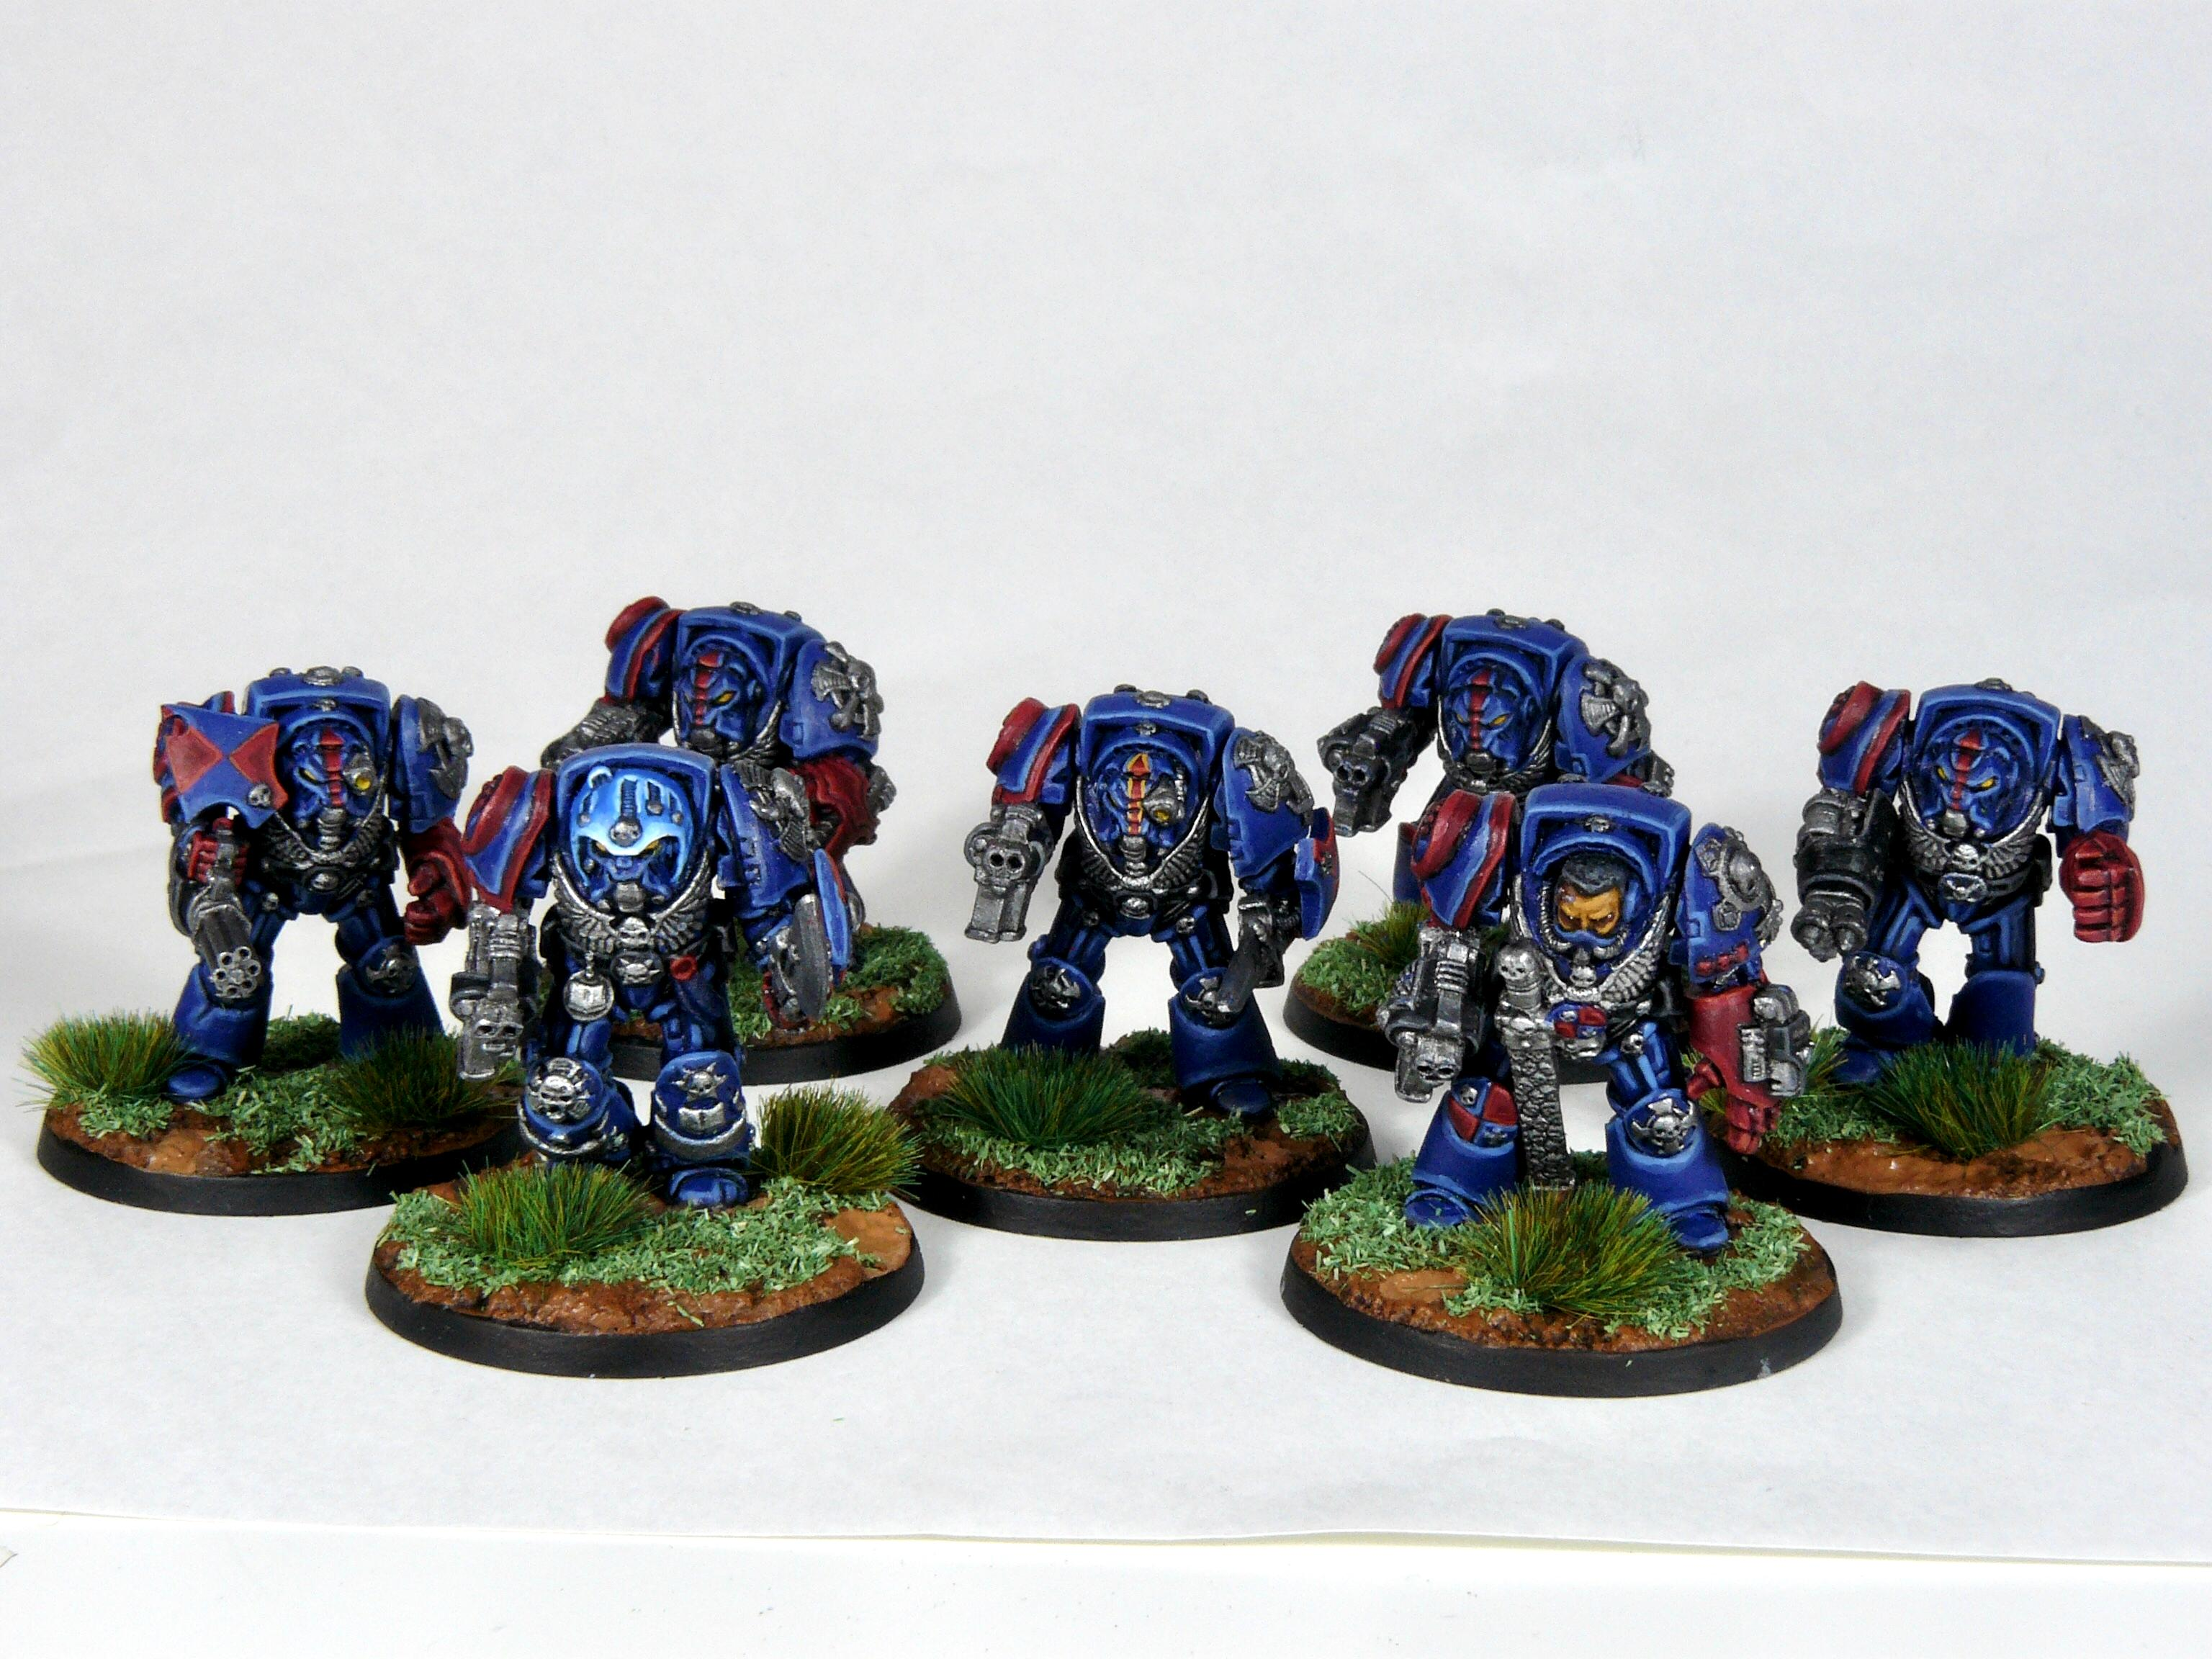 Captain, Librarian, Rogue Trader, Rtb9, Space Marines, Terminator Armor, Warhammer 40,000